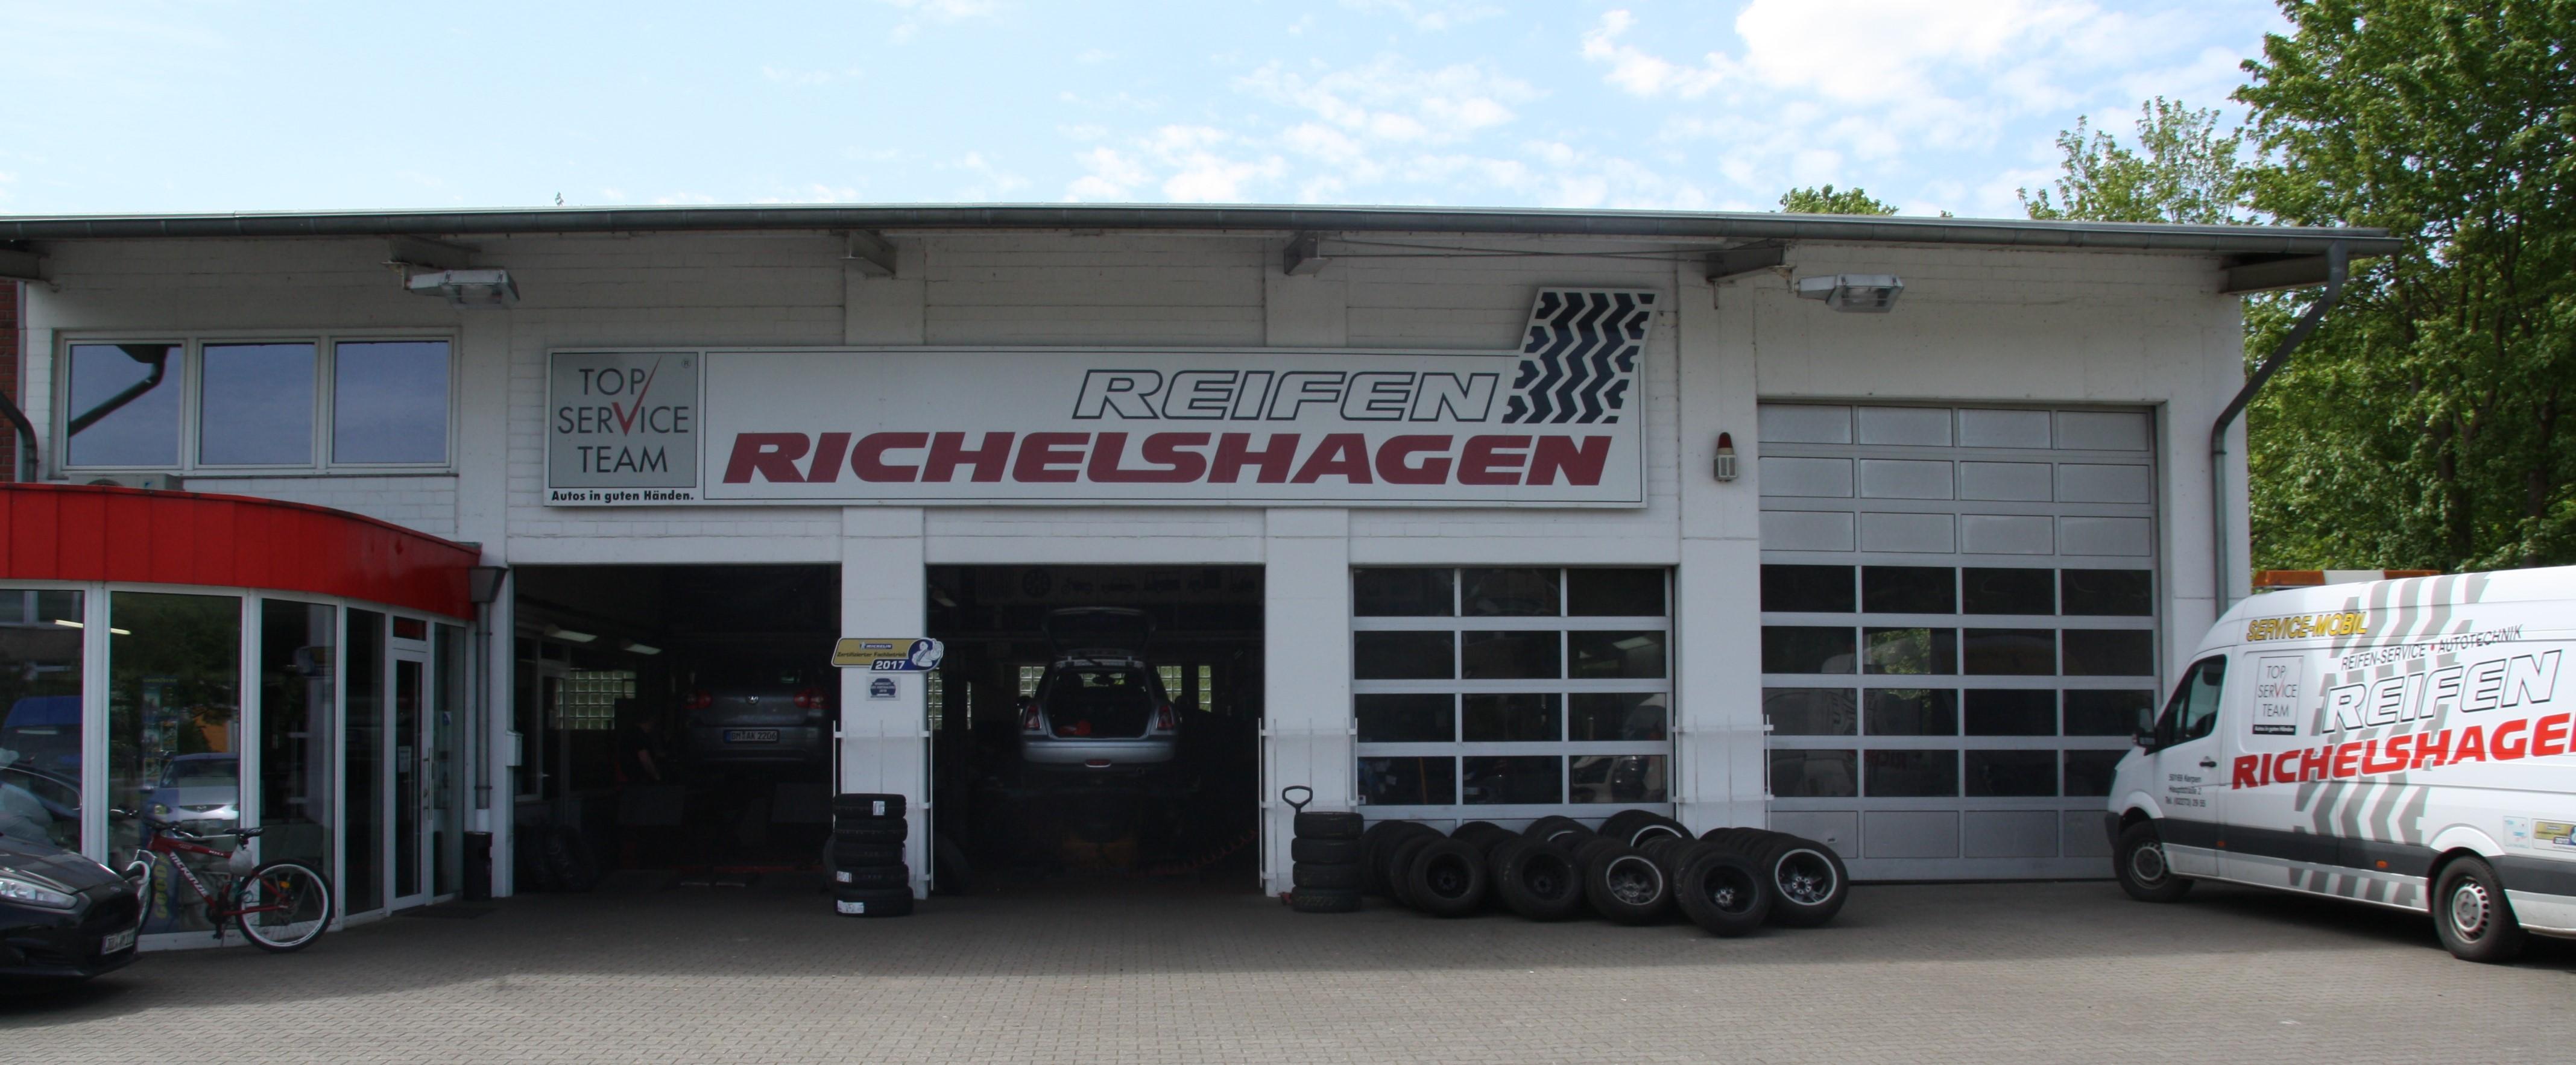 Richelshagen-Kerpen1